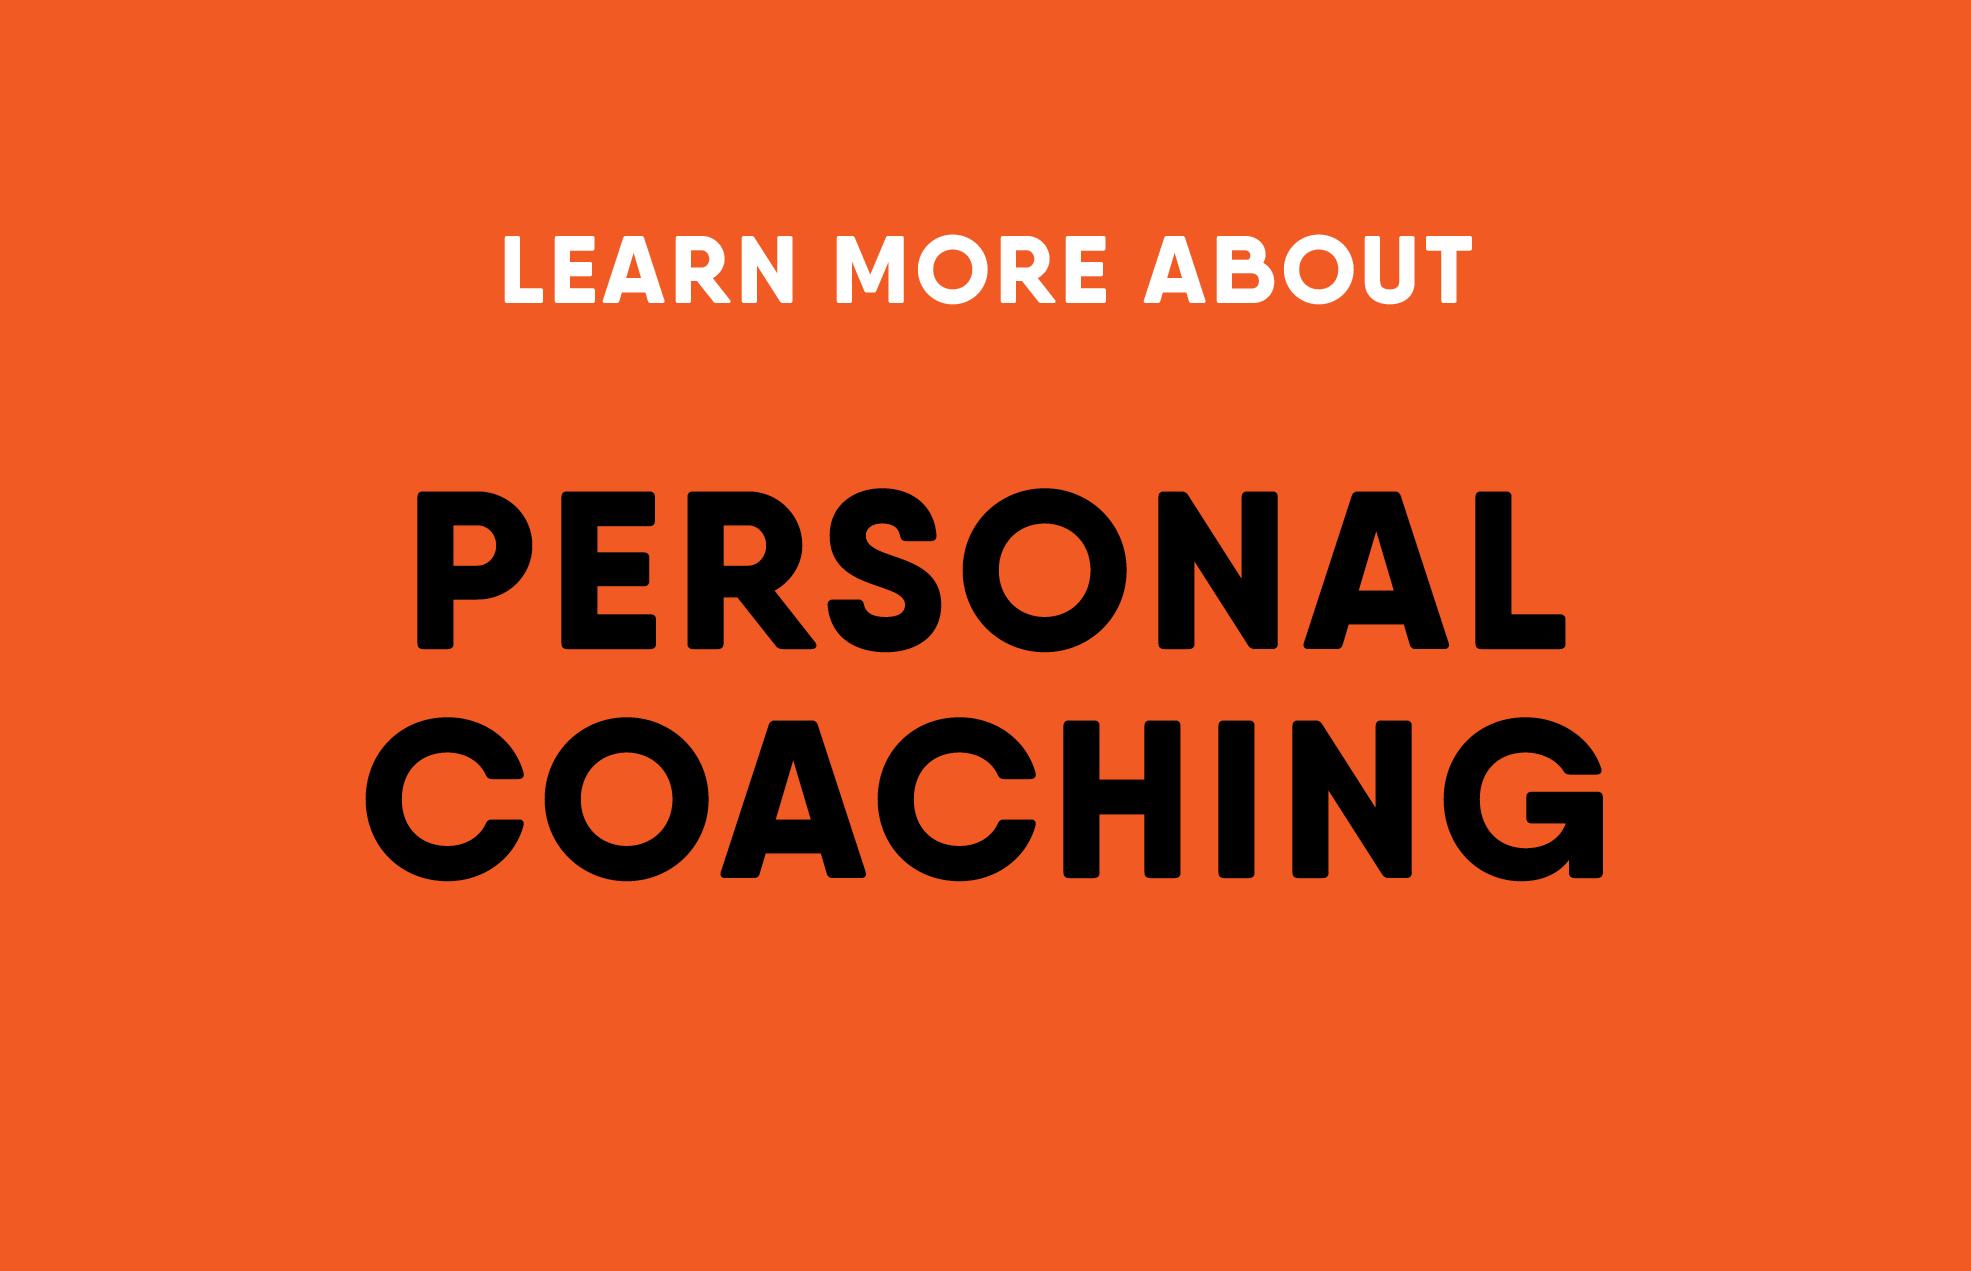 RLF-CoachingLinkBox.jpg